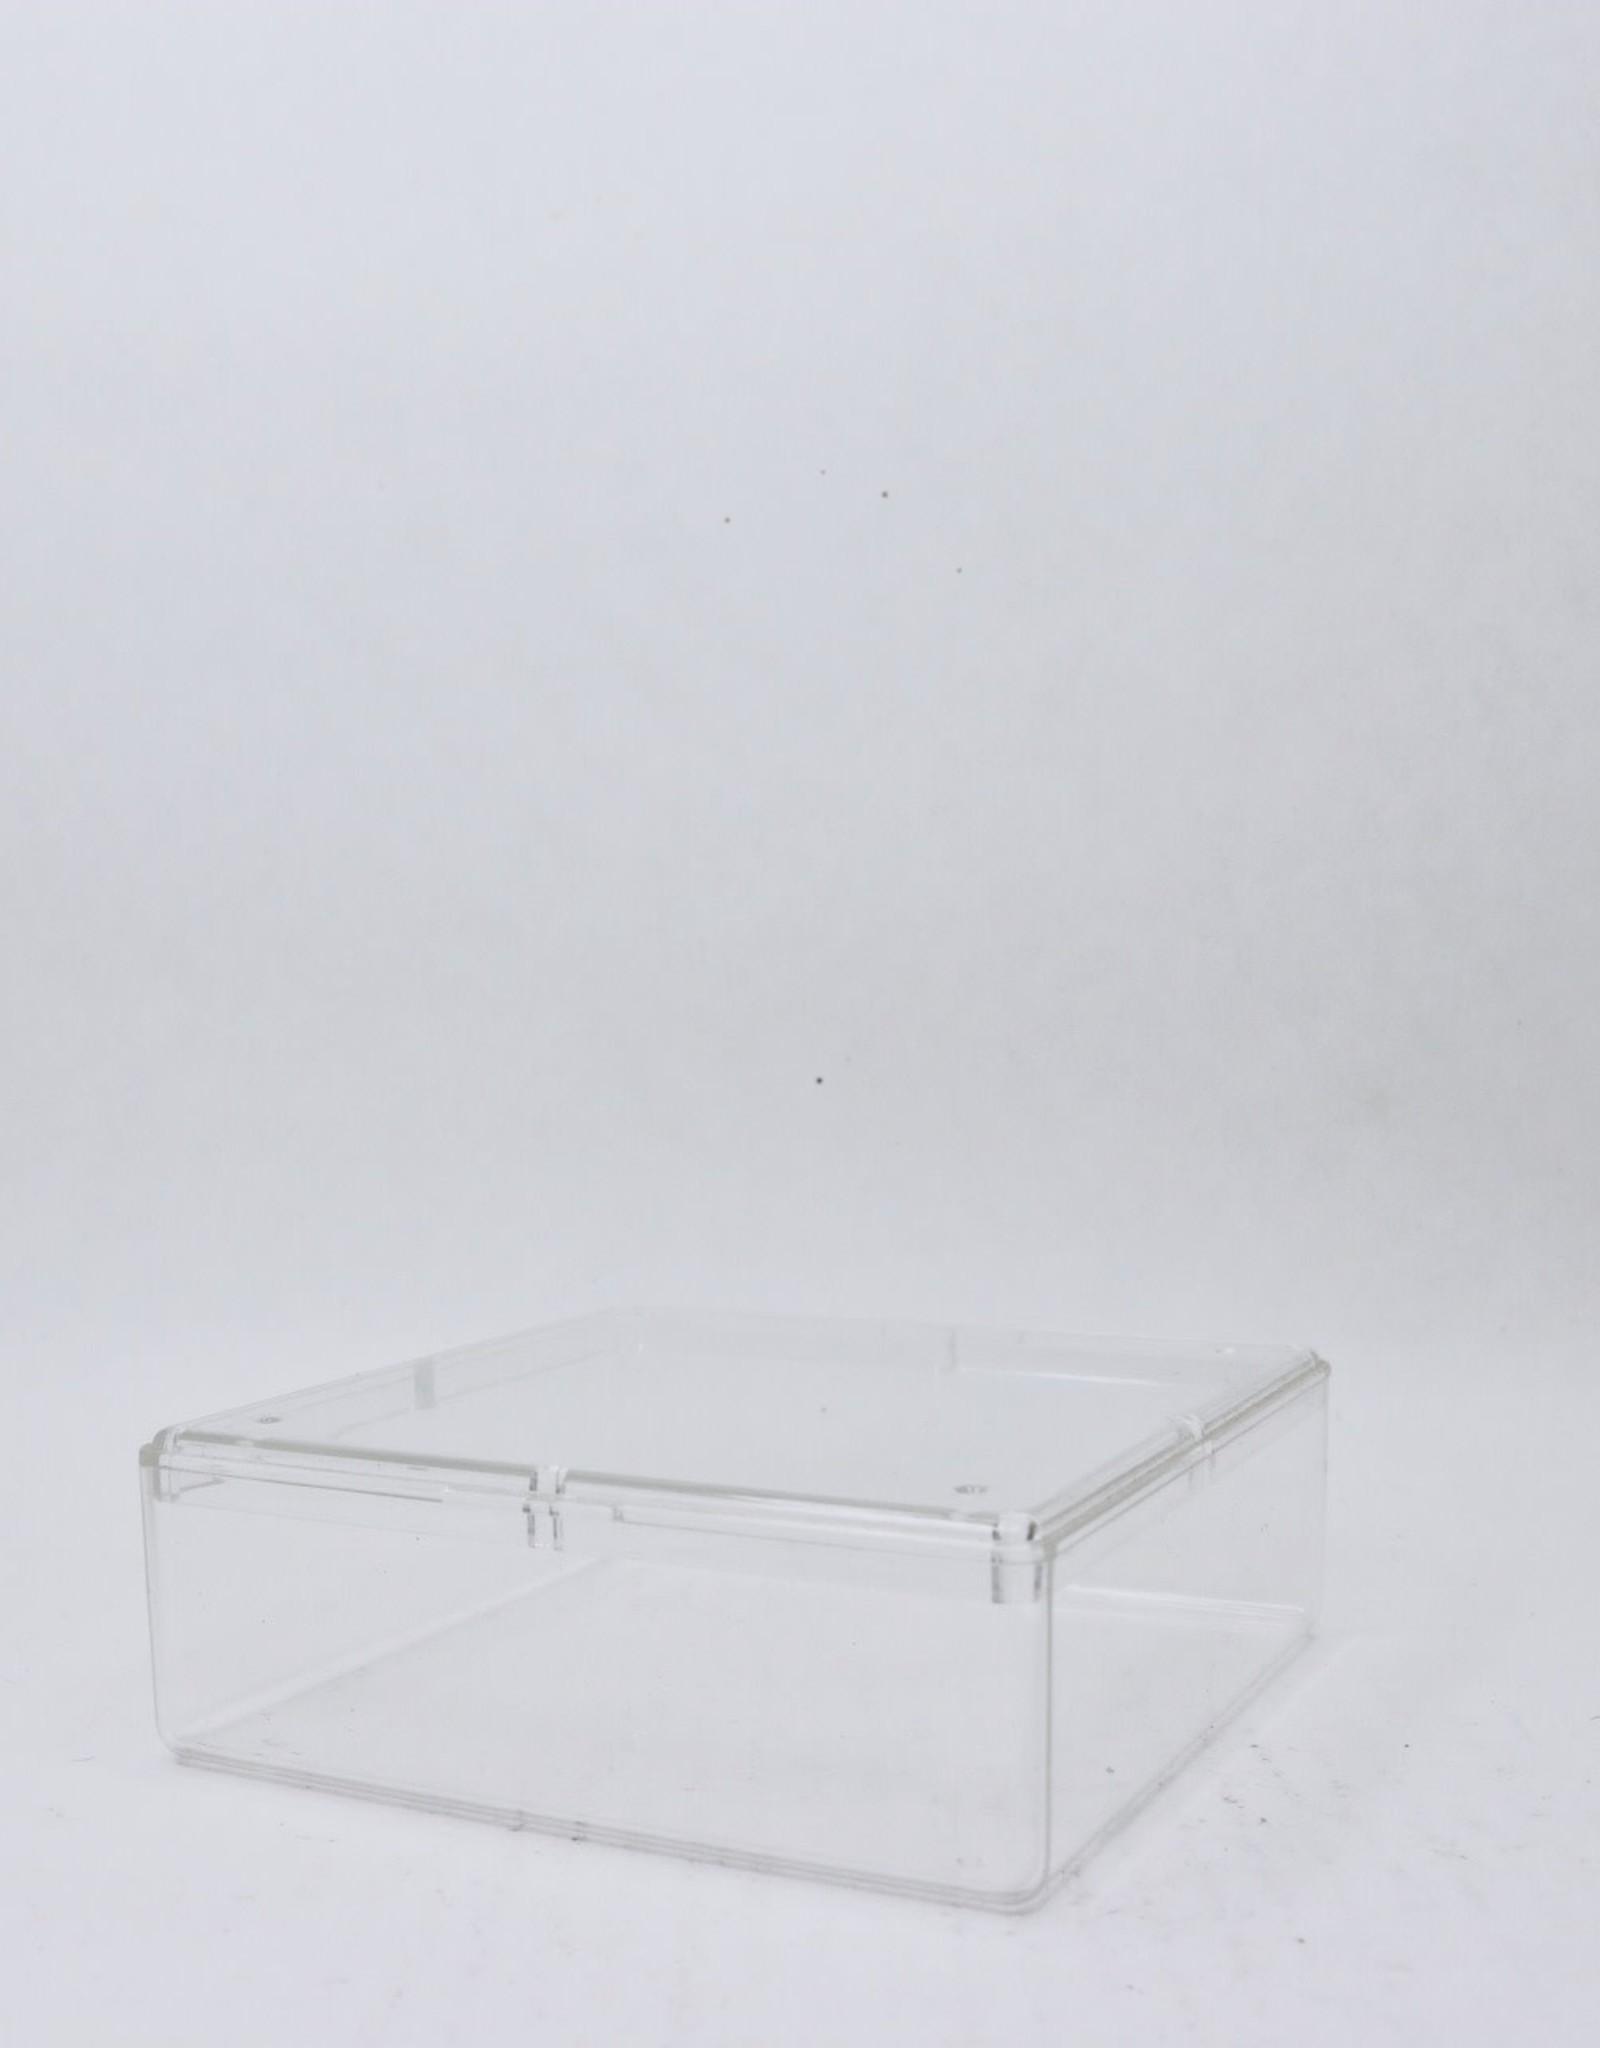 Cut-Comb Honey Boxes, Case of 100